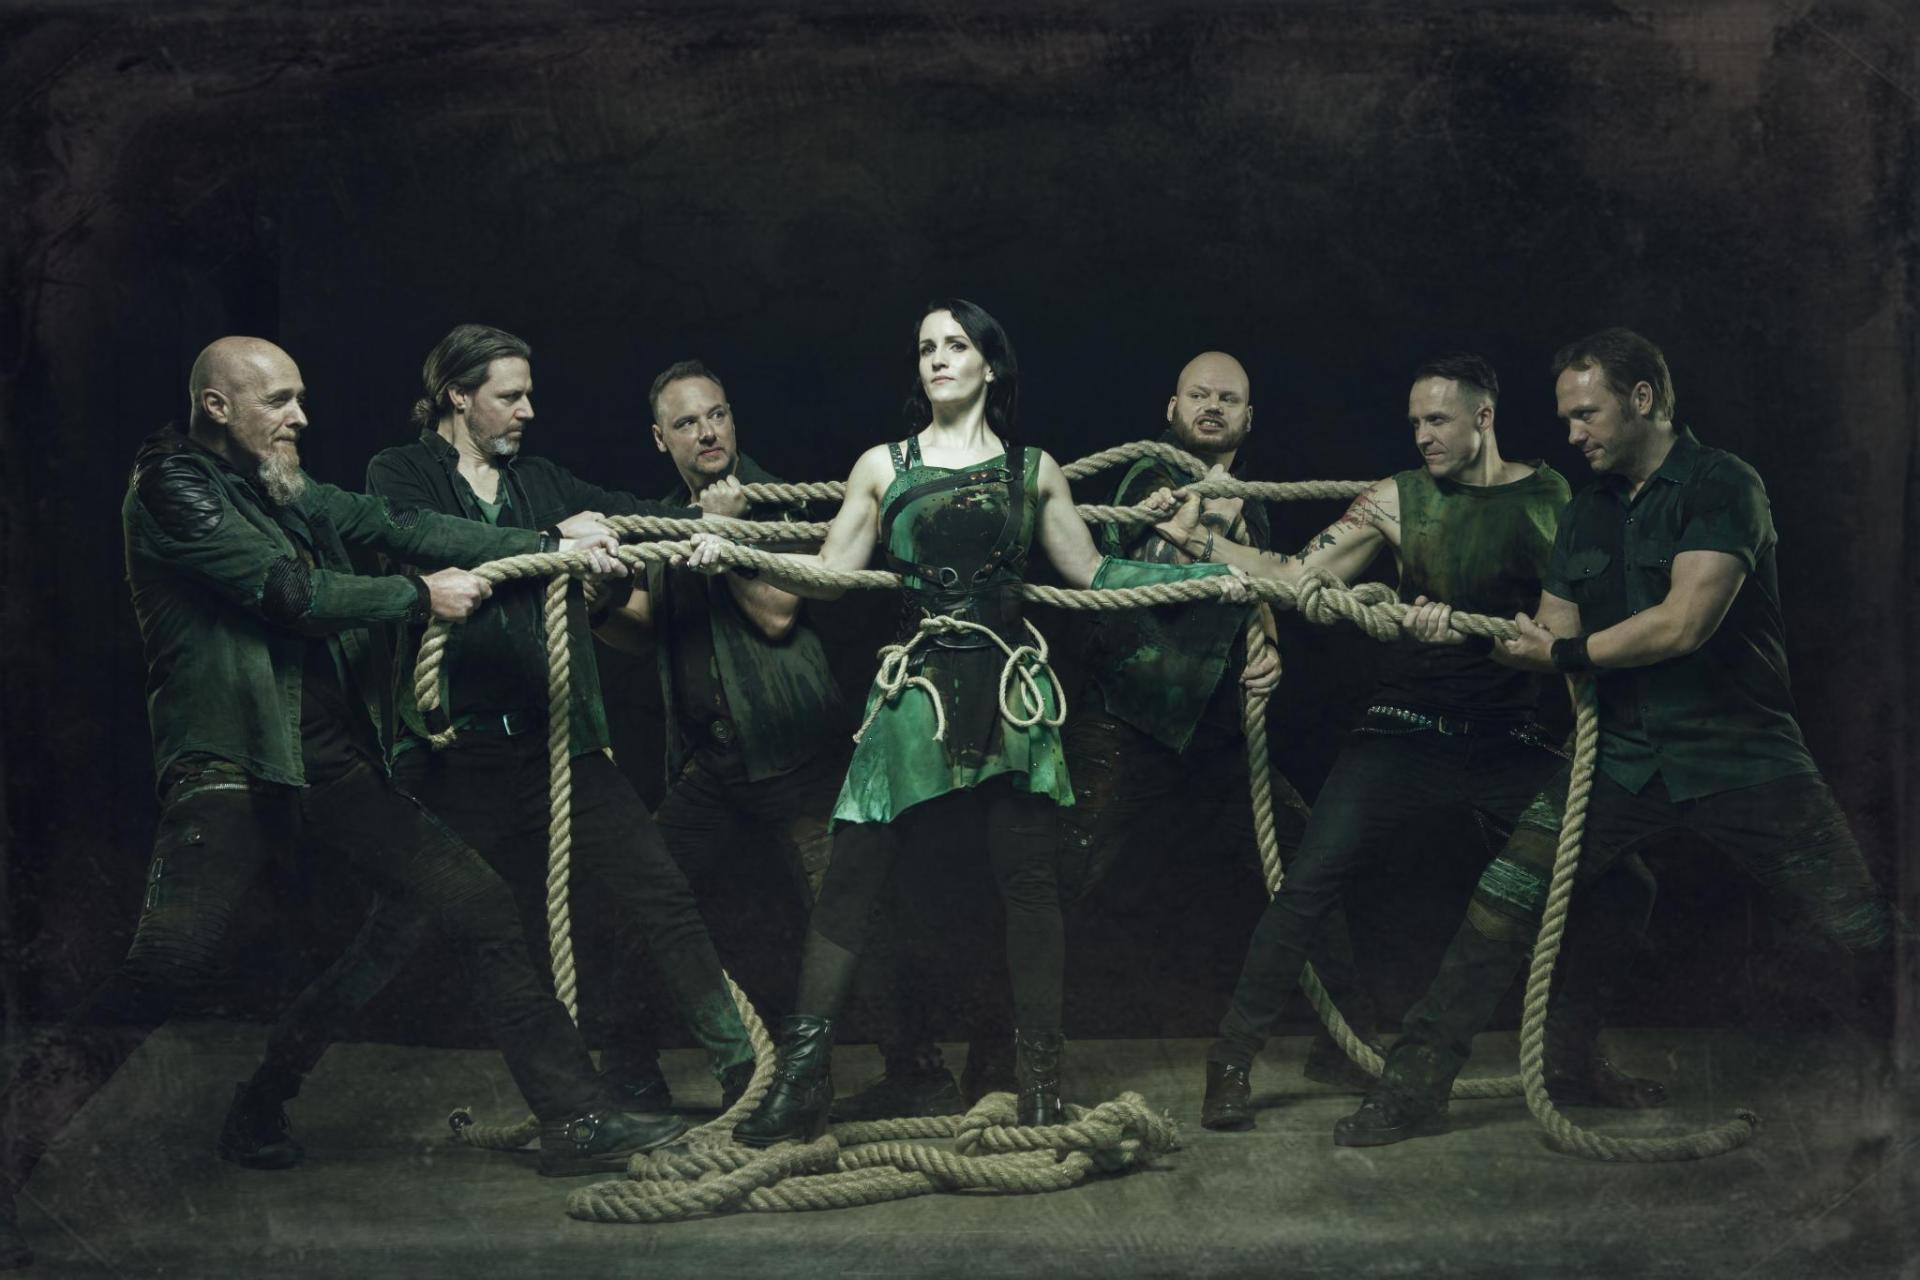 Van Canto - Acapella-Metal in Höchstform mit neues album